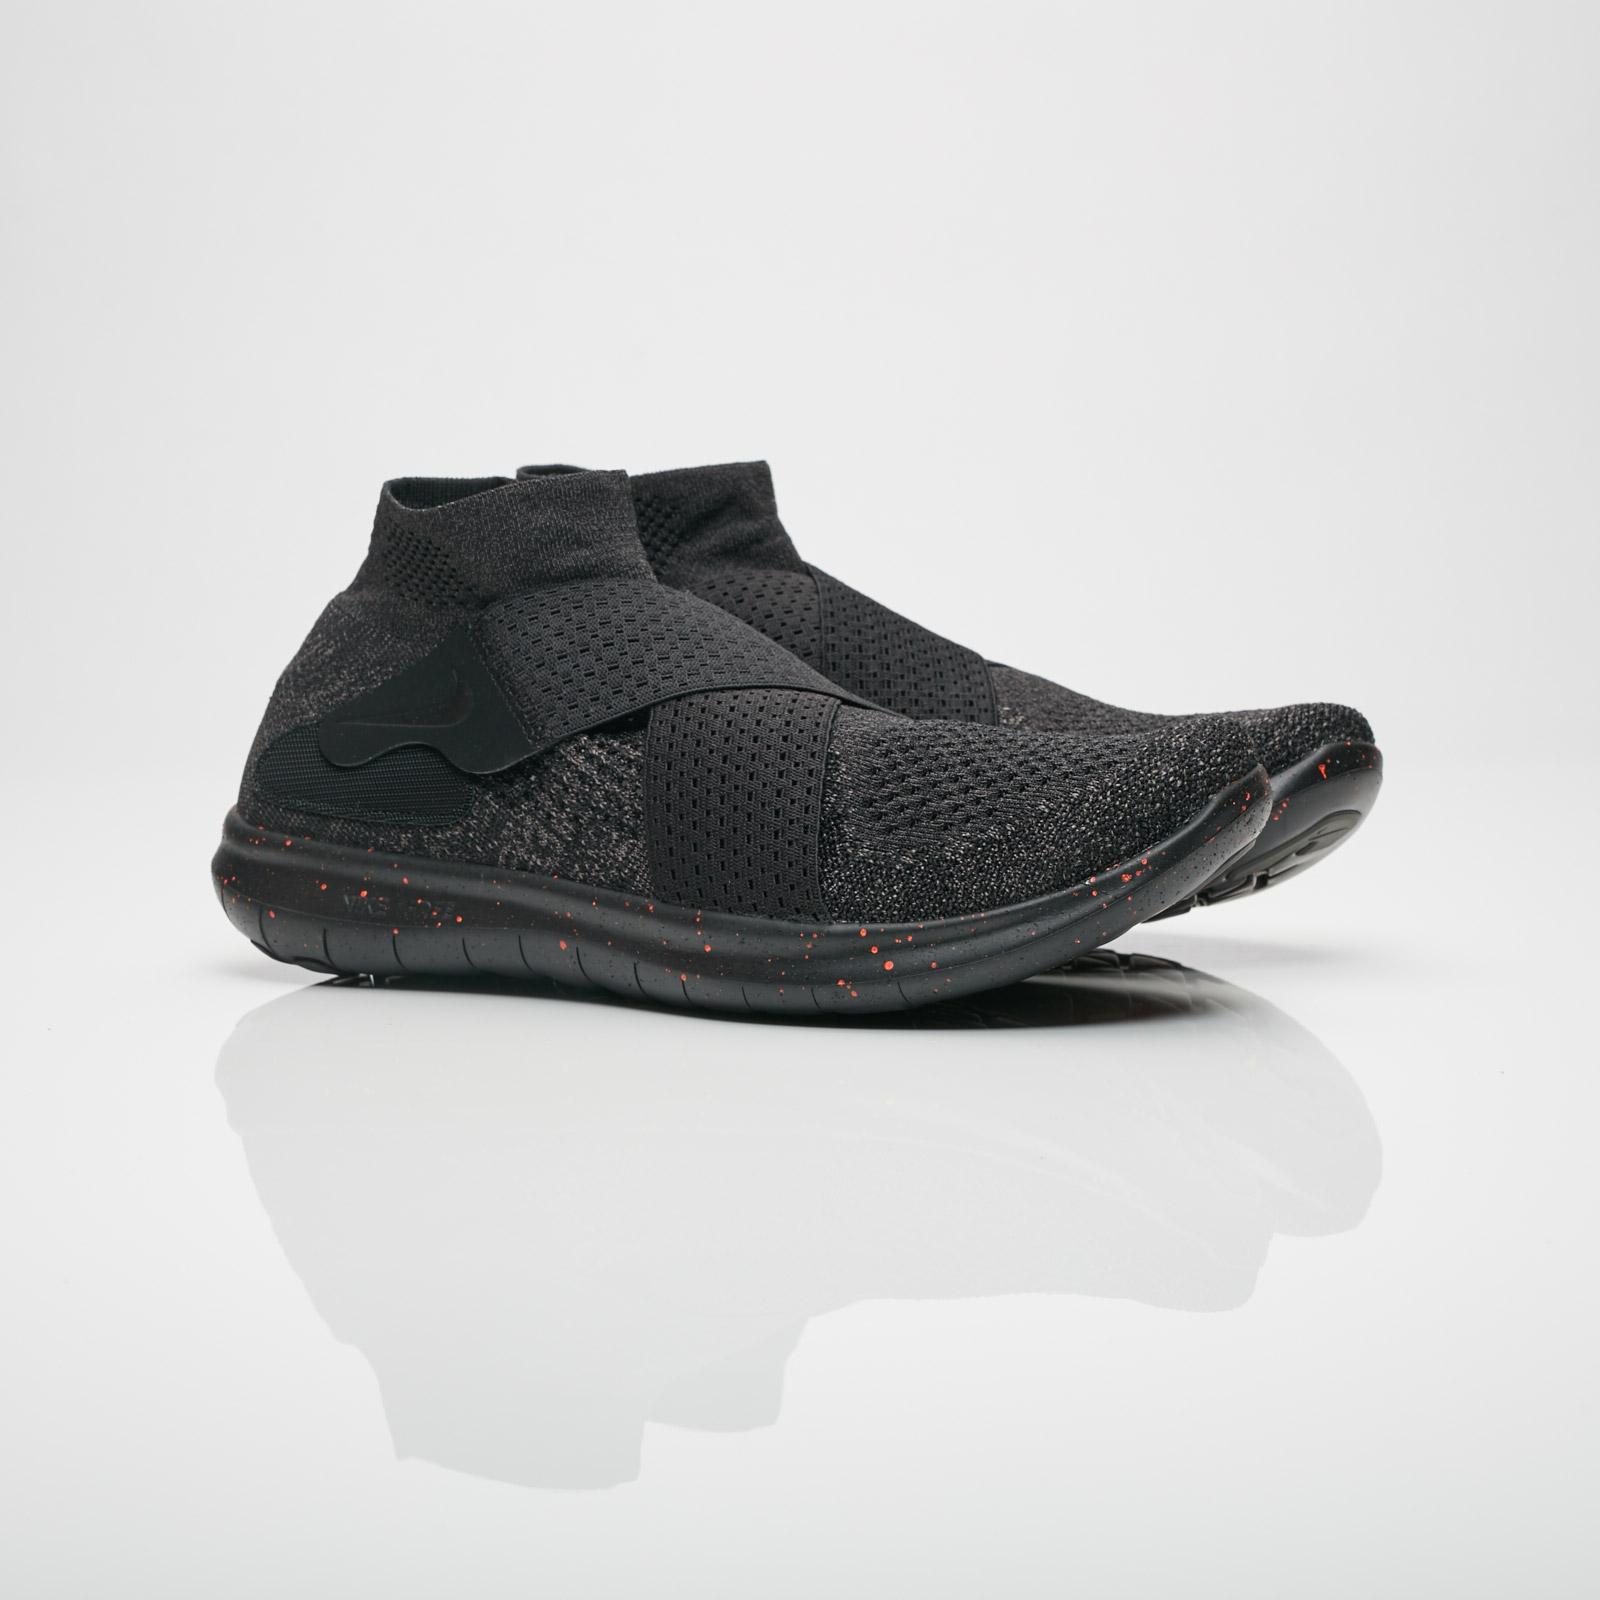 15211ab1bb351 Nike Free RN Motion FK 2017 - 883291-010 - Sneakersnstuff